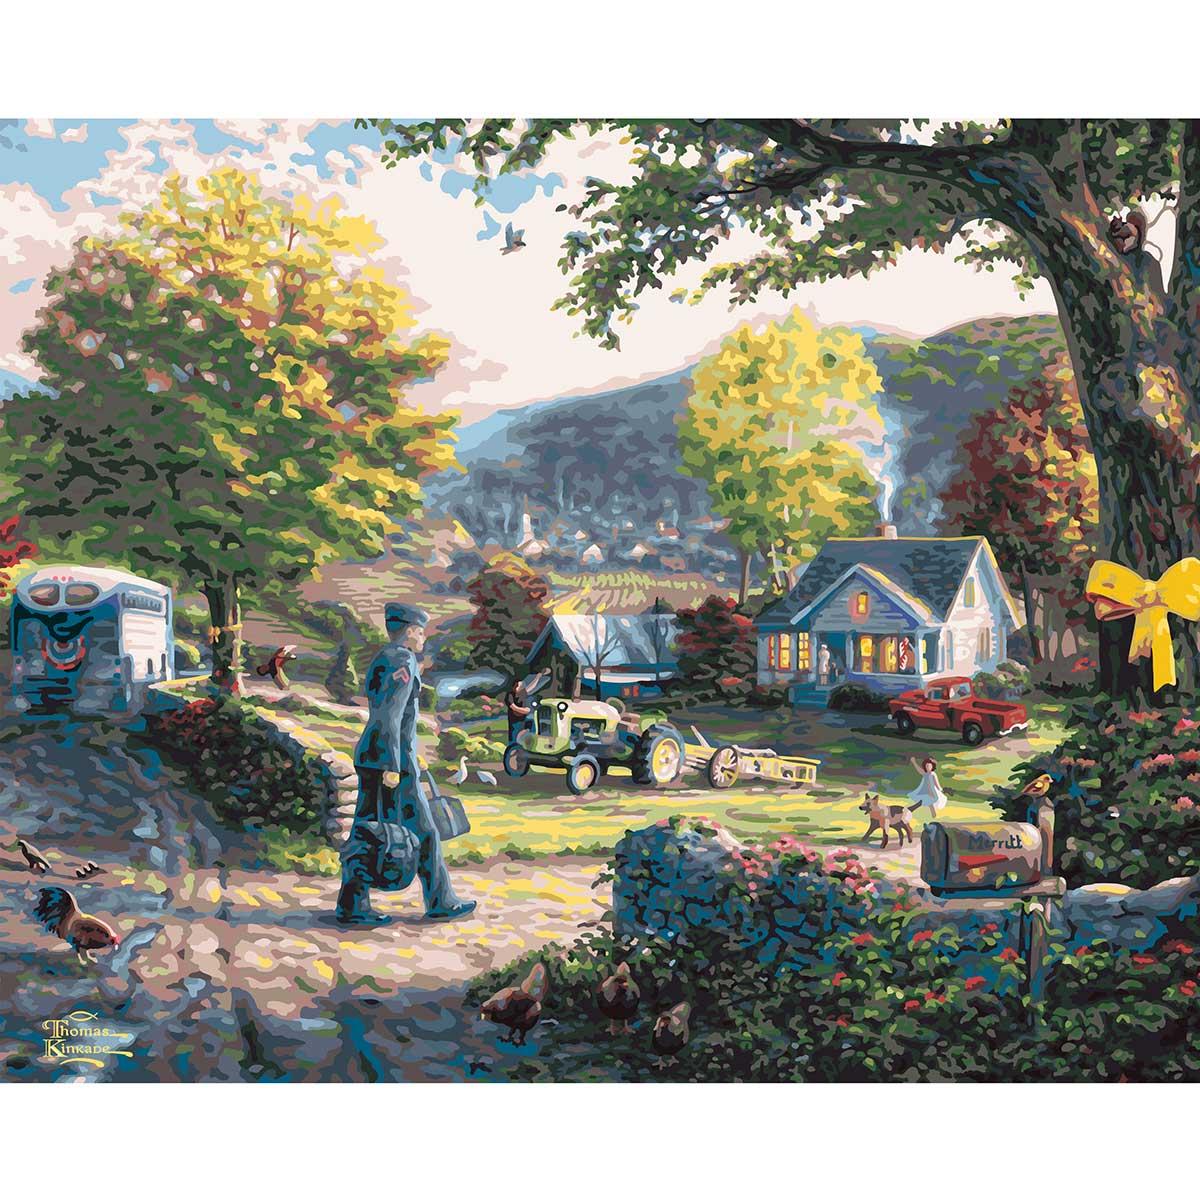 Plaid ® Paint by Number - Thomas Kinkade™ - Homecoming Hero